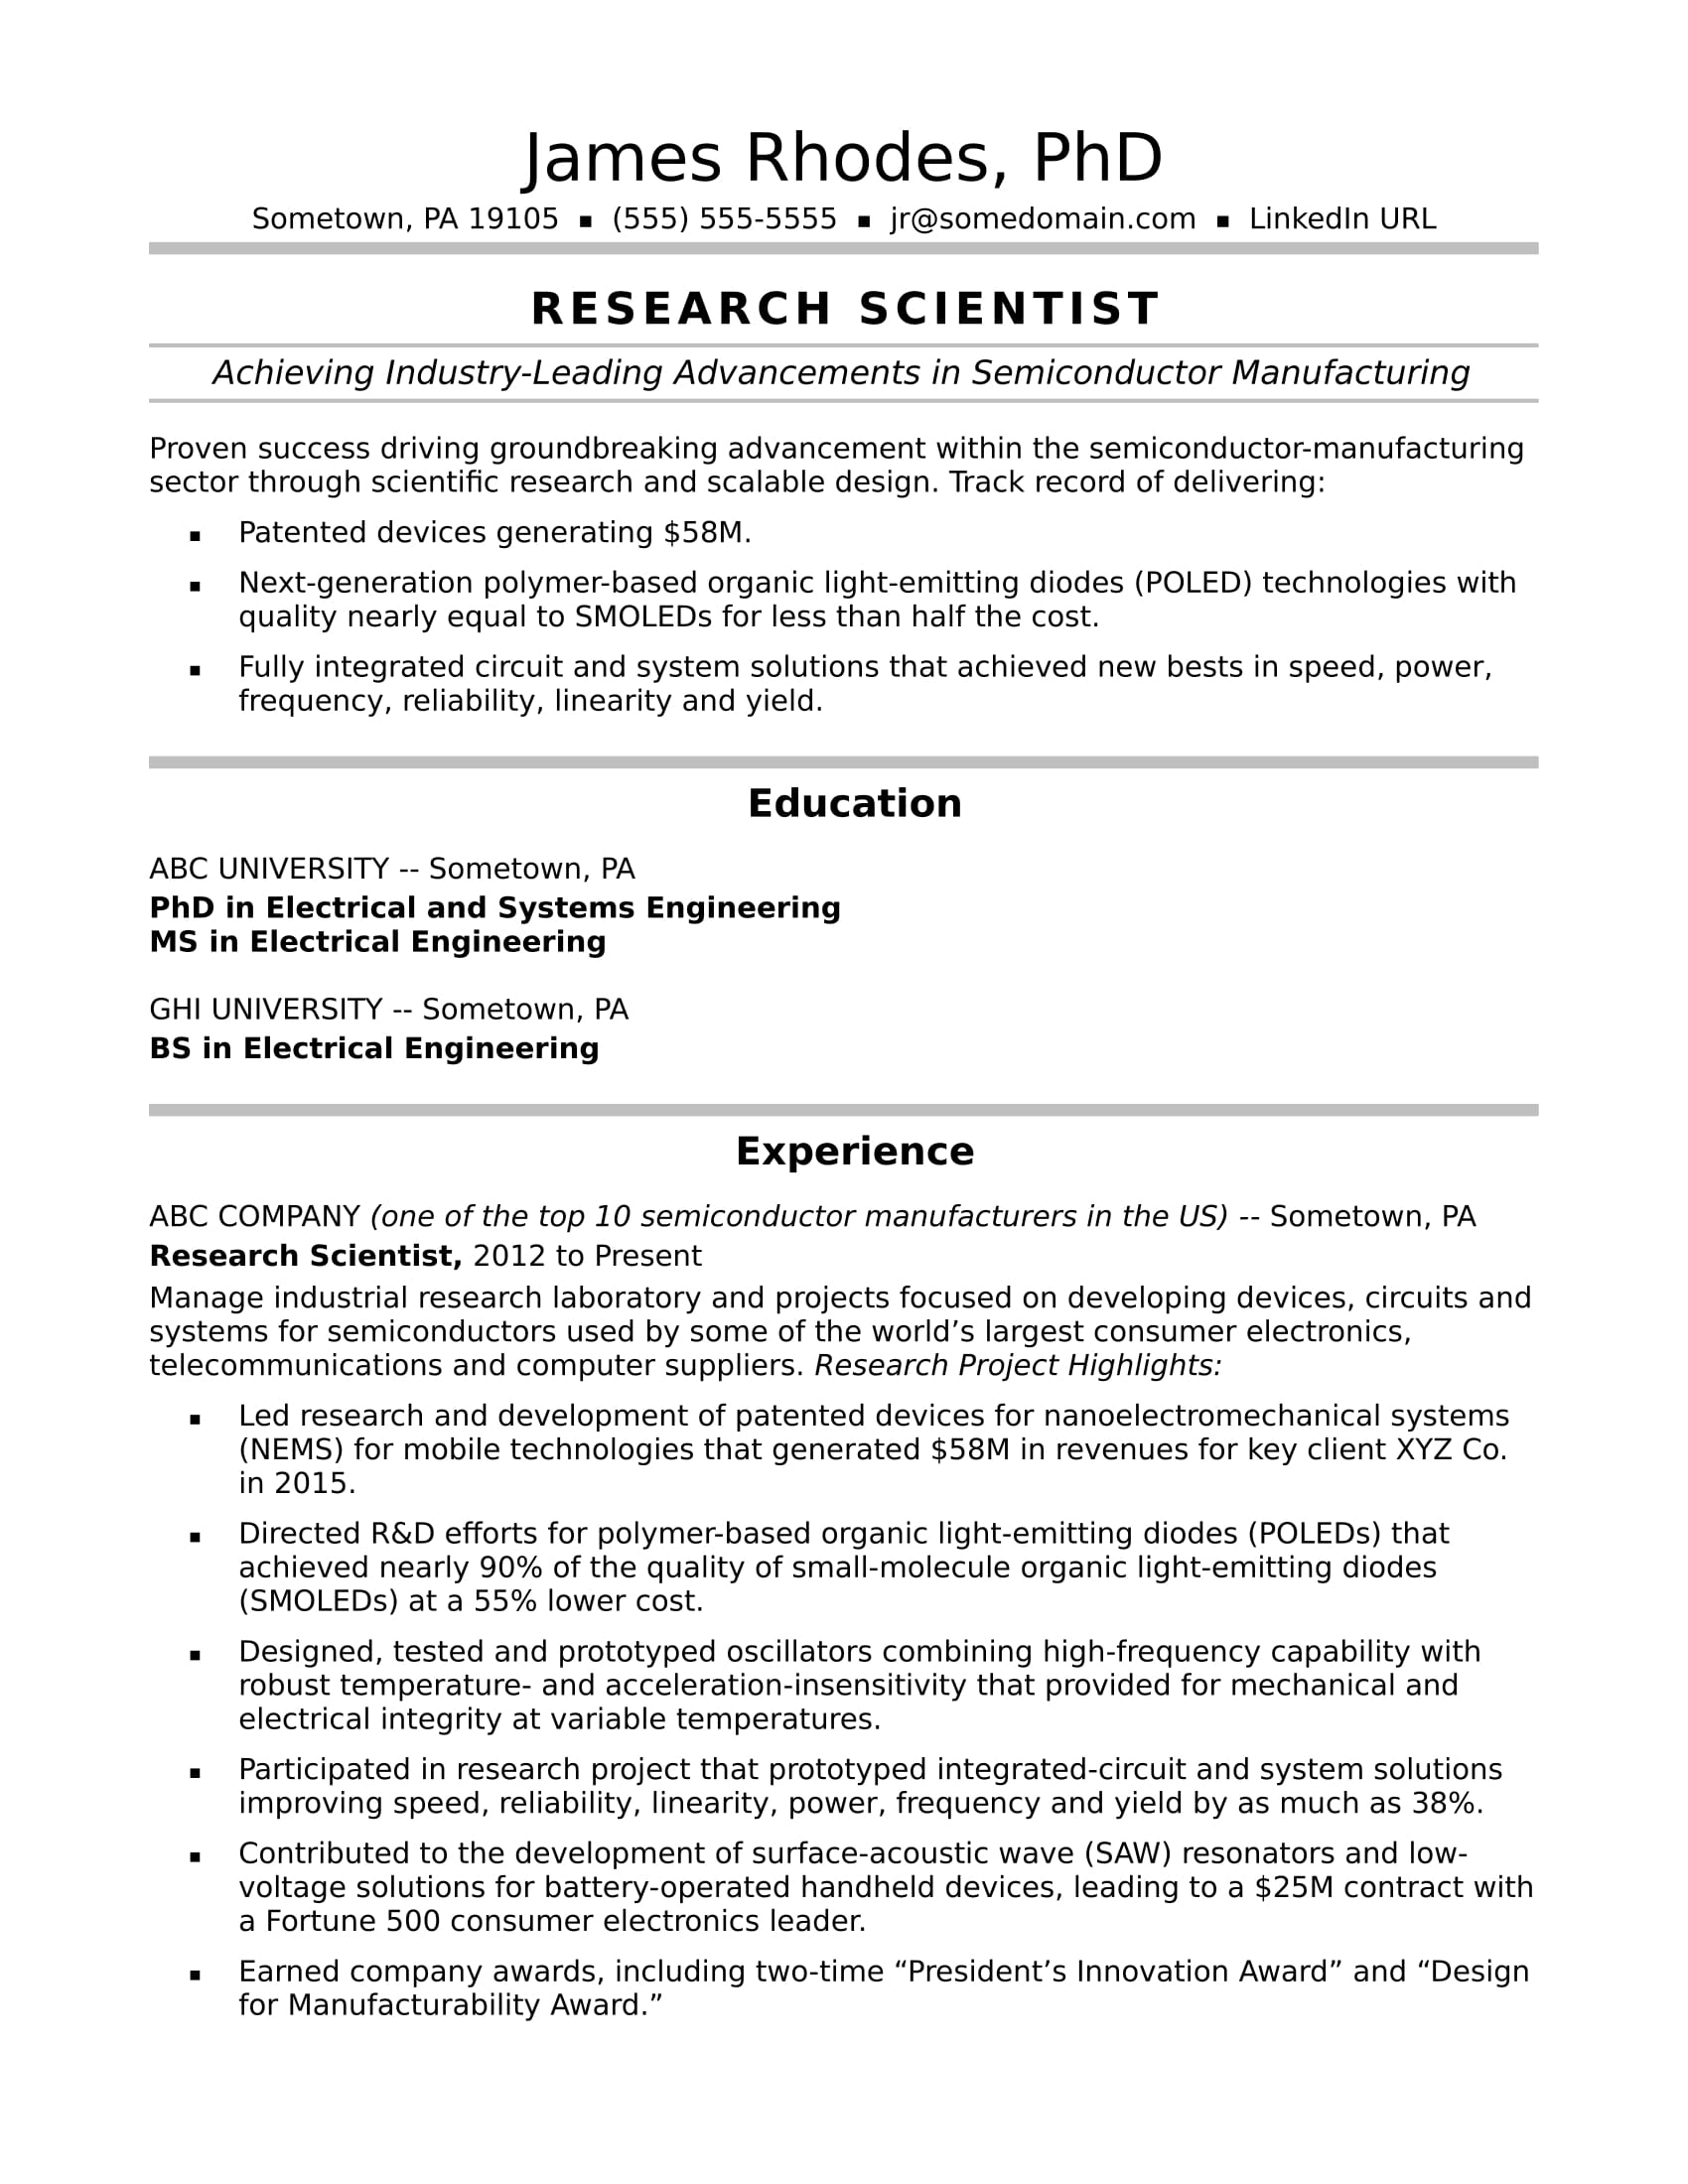 Research Scientist Resume Sample  Monstercom